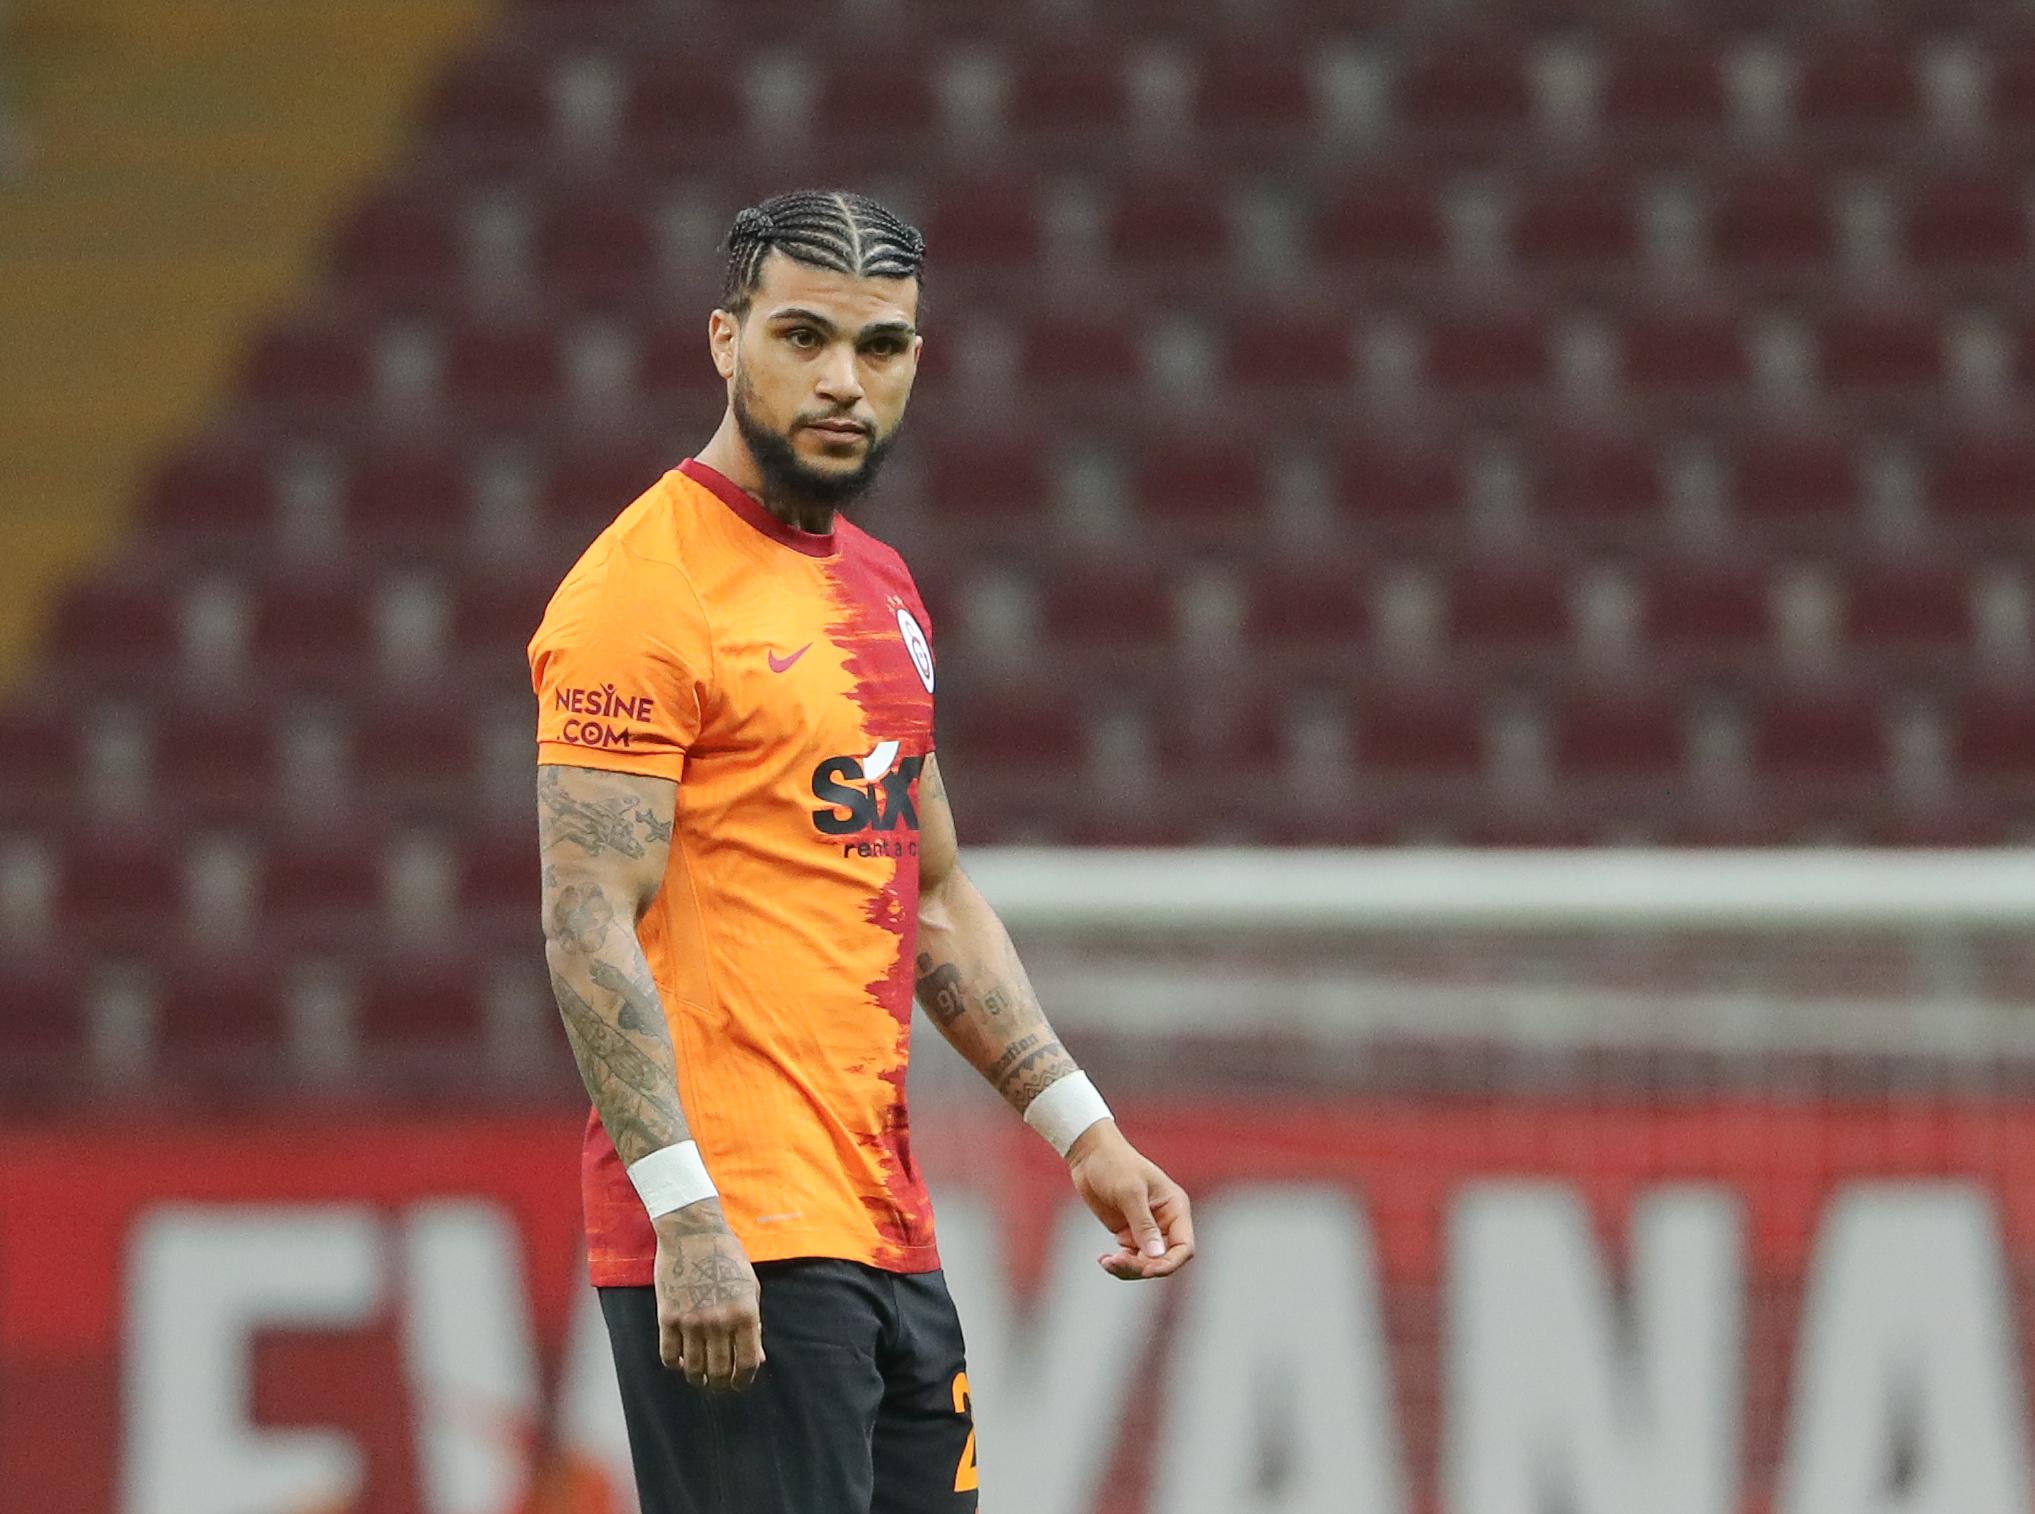 Galatasaray v Alanyaspor - Turkish Cup